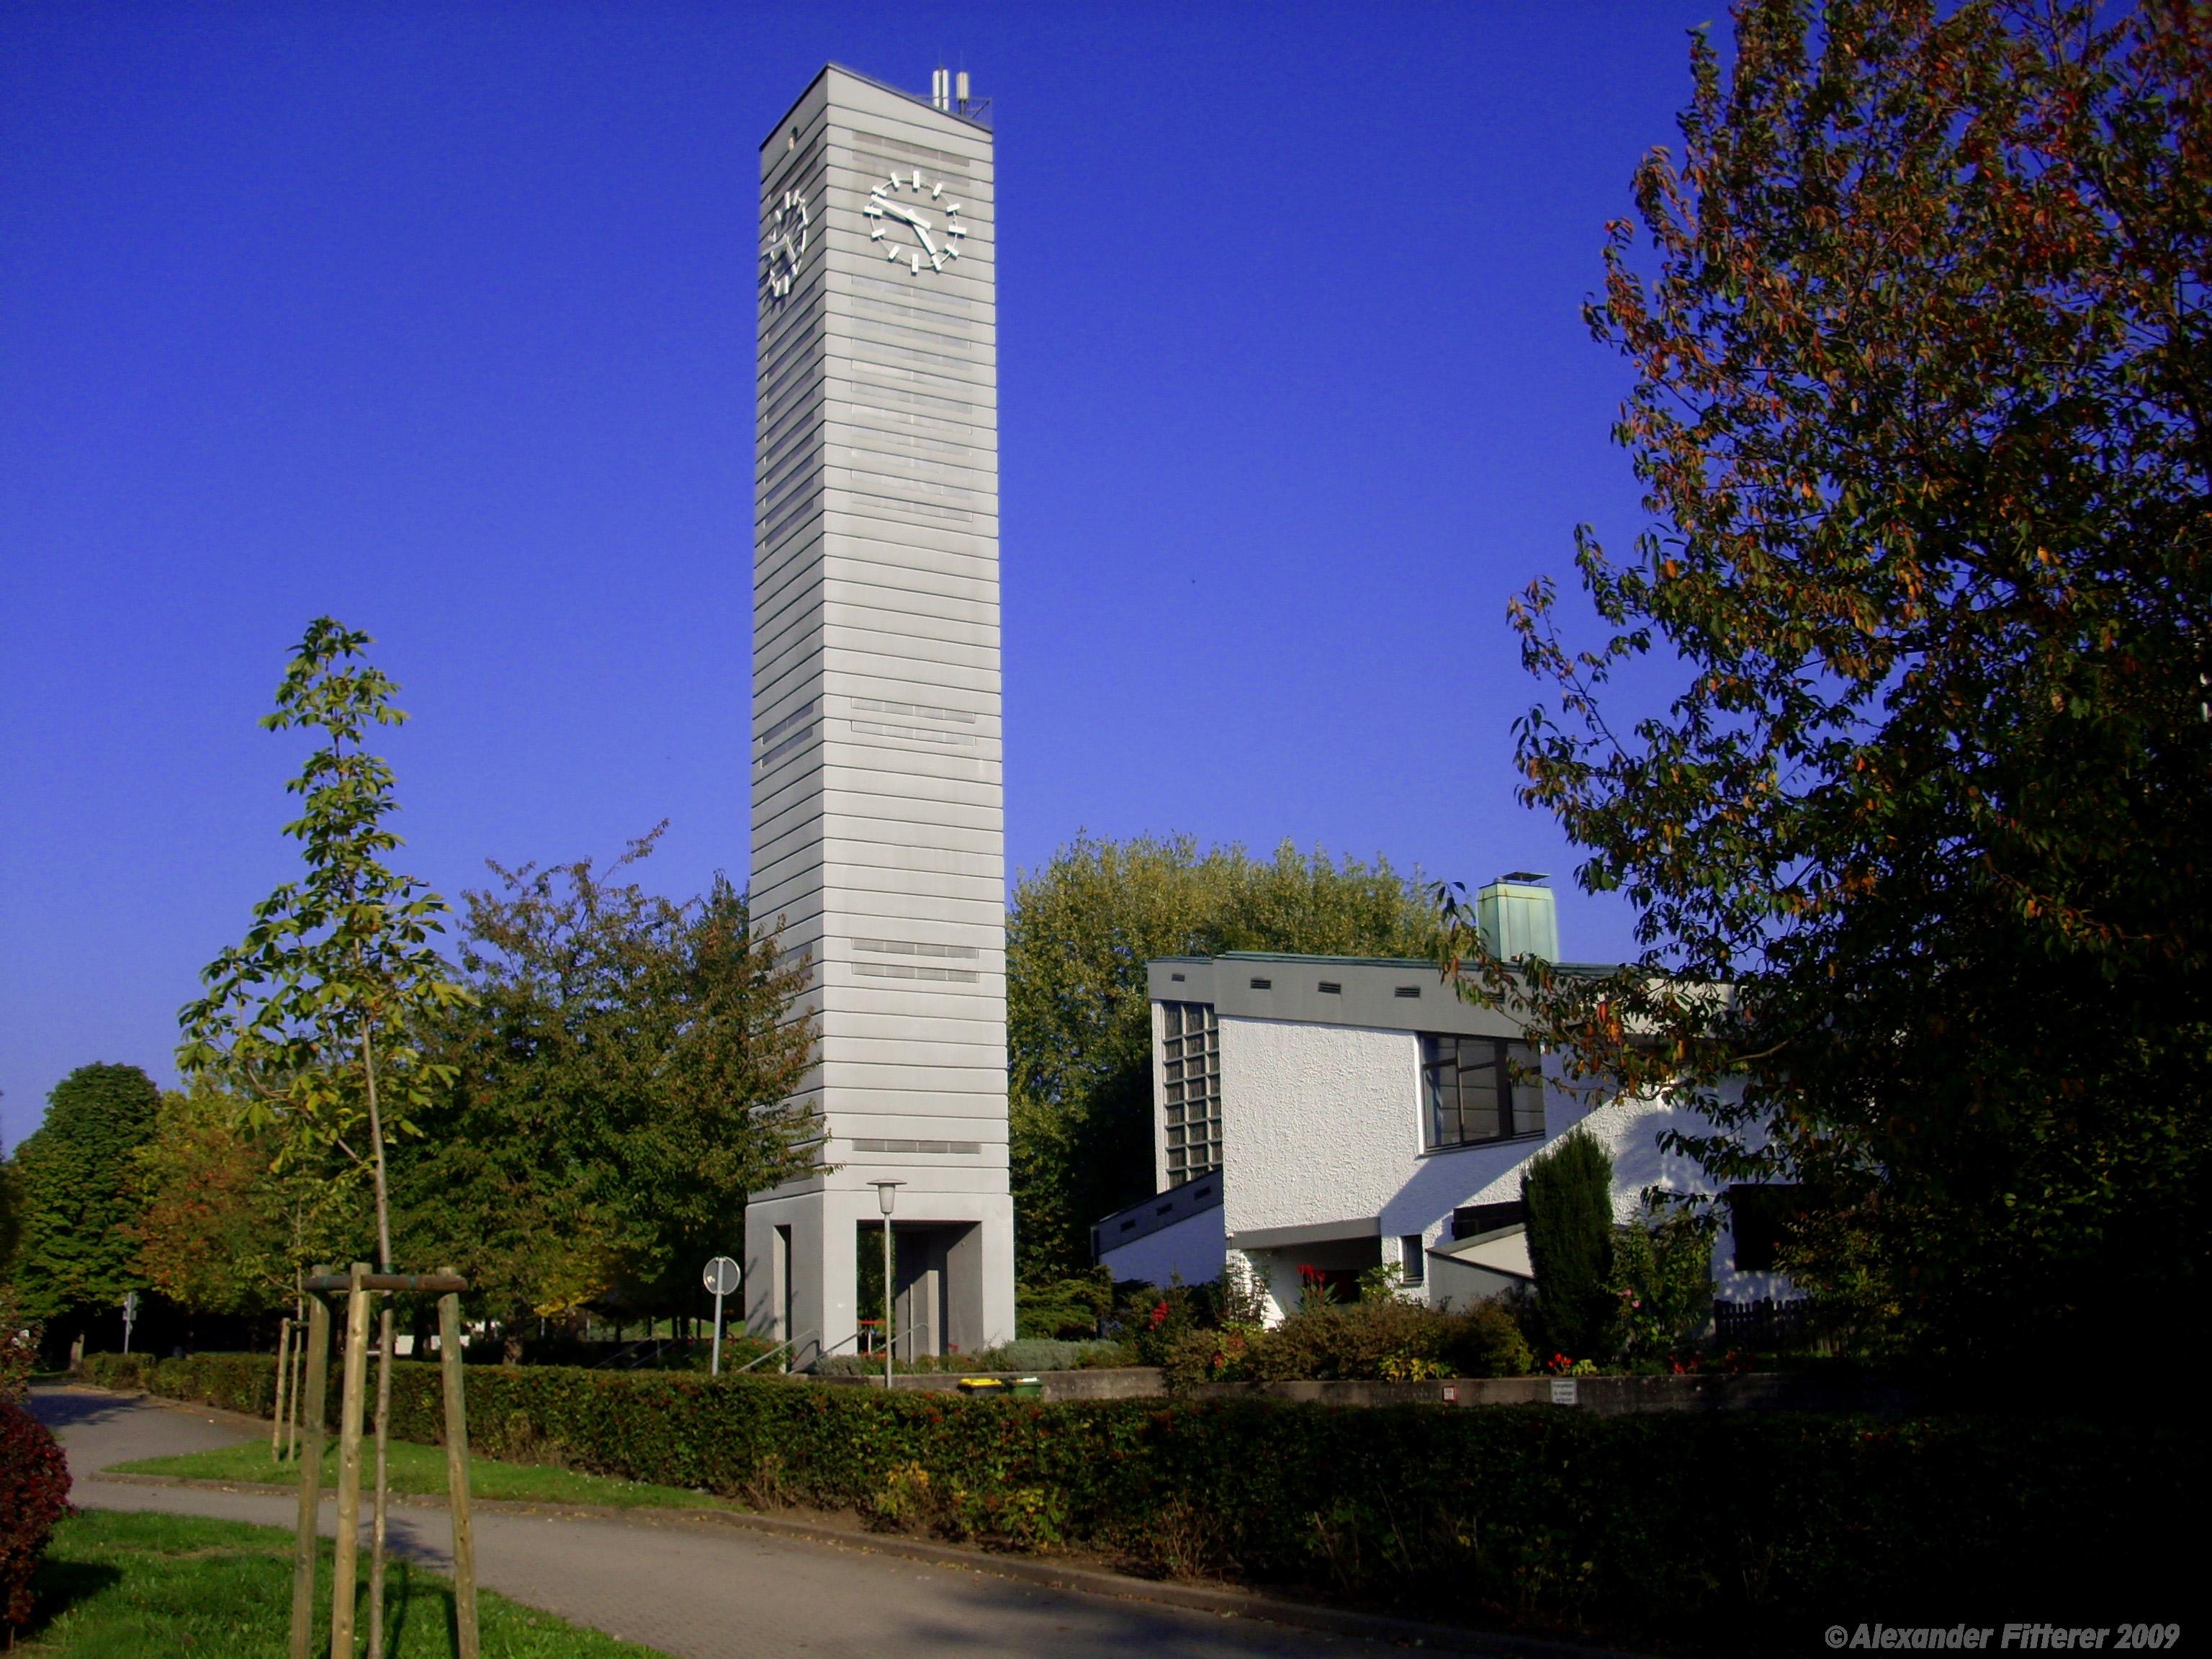 Gaggenau-Bad Rotenfels, Johanneskirche, 2009 (Bild: Alexander Fitterer, 2009, mapio.de)